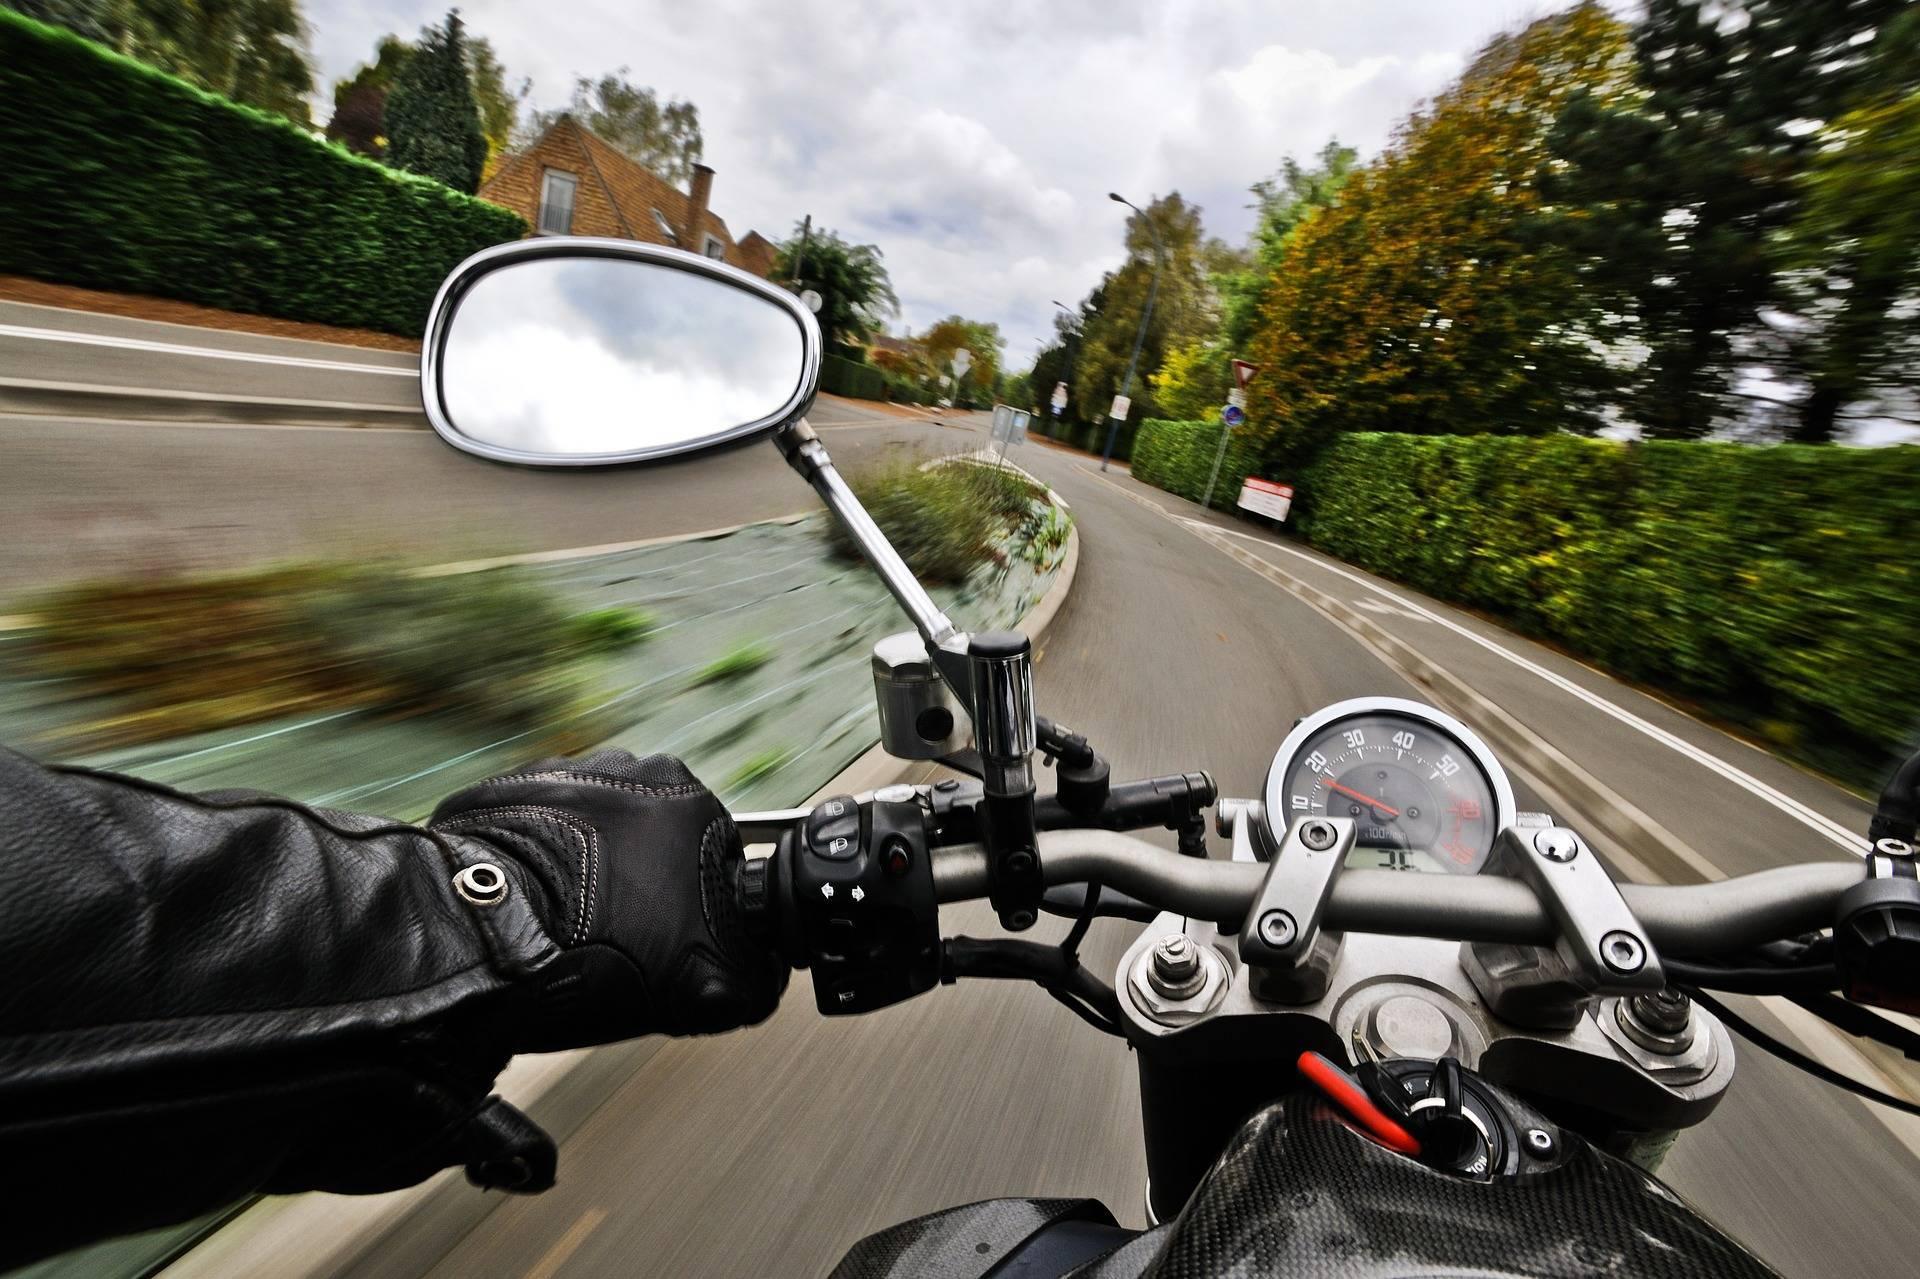 187cea31197ae7b7e3bb_goochs_garlic_run_motorcycle-1827482_1920.jpg